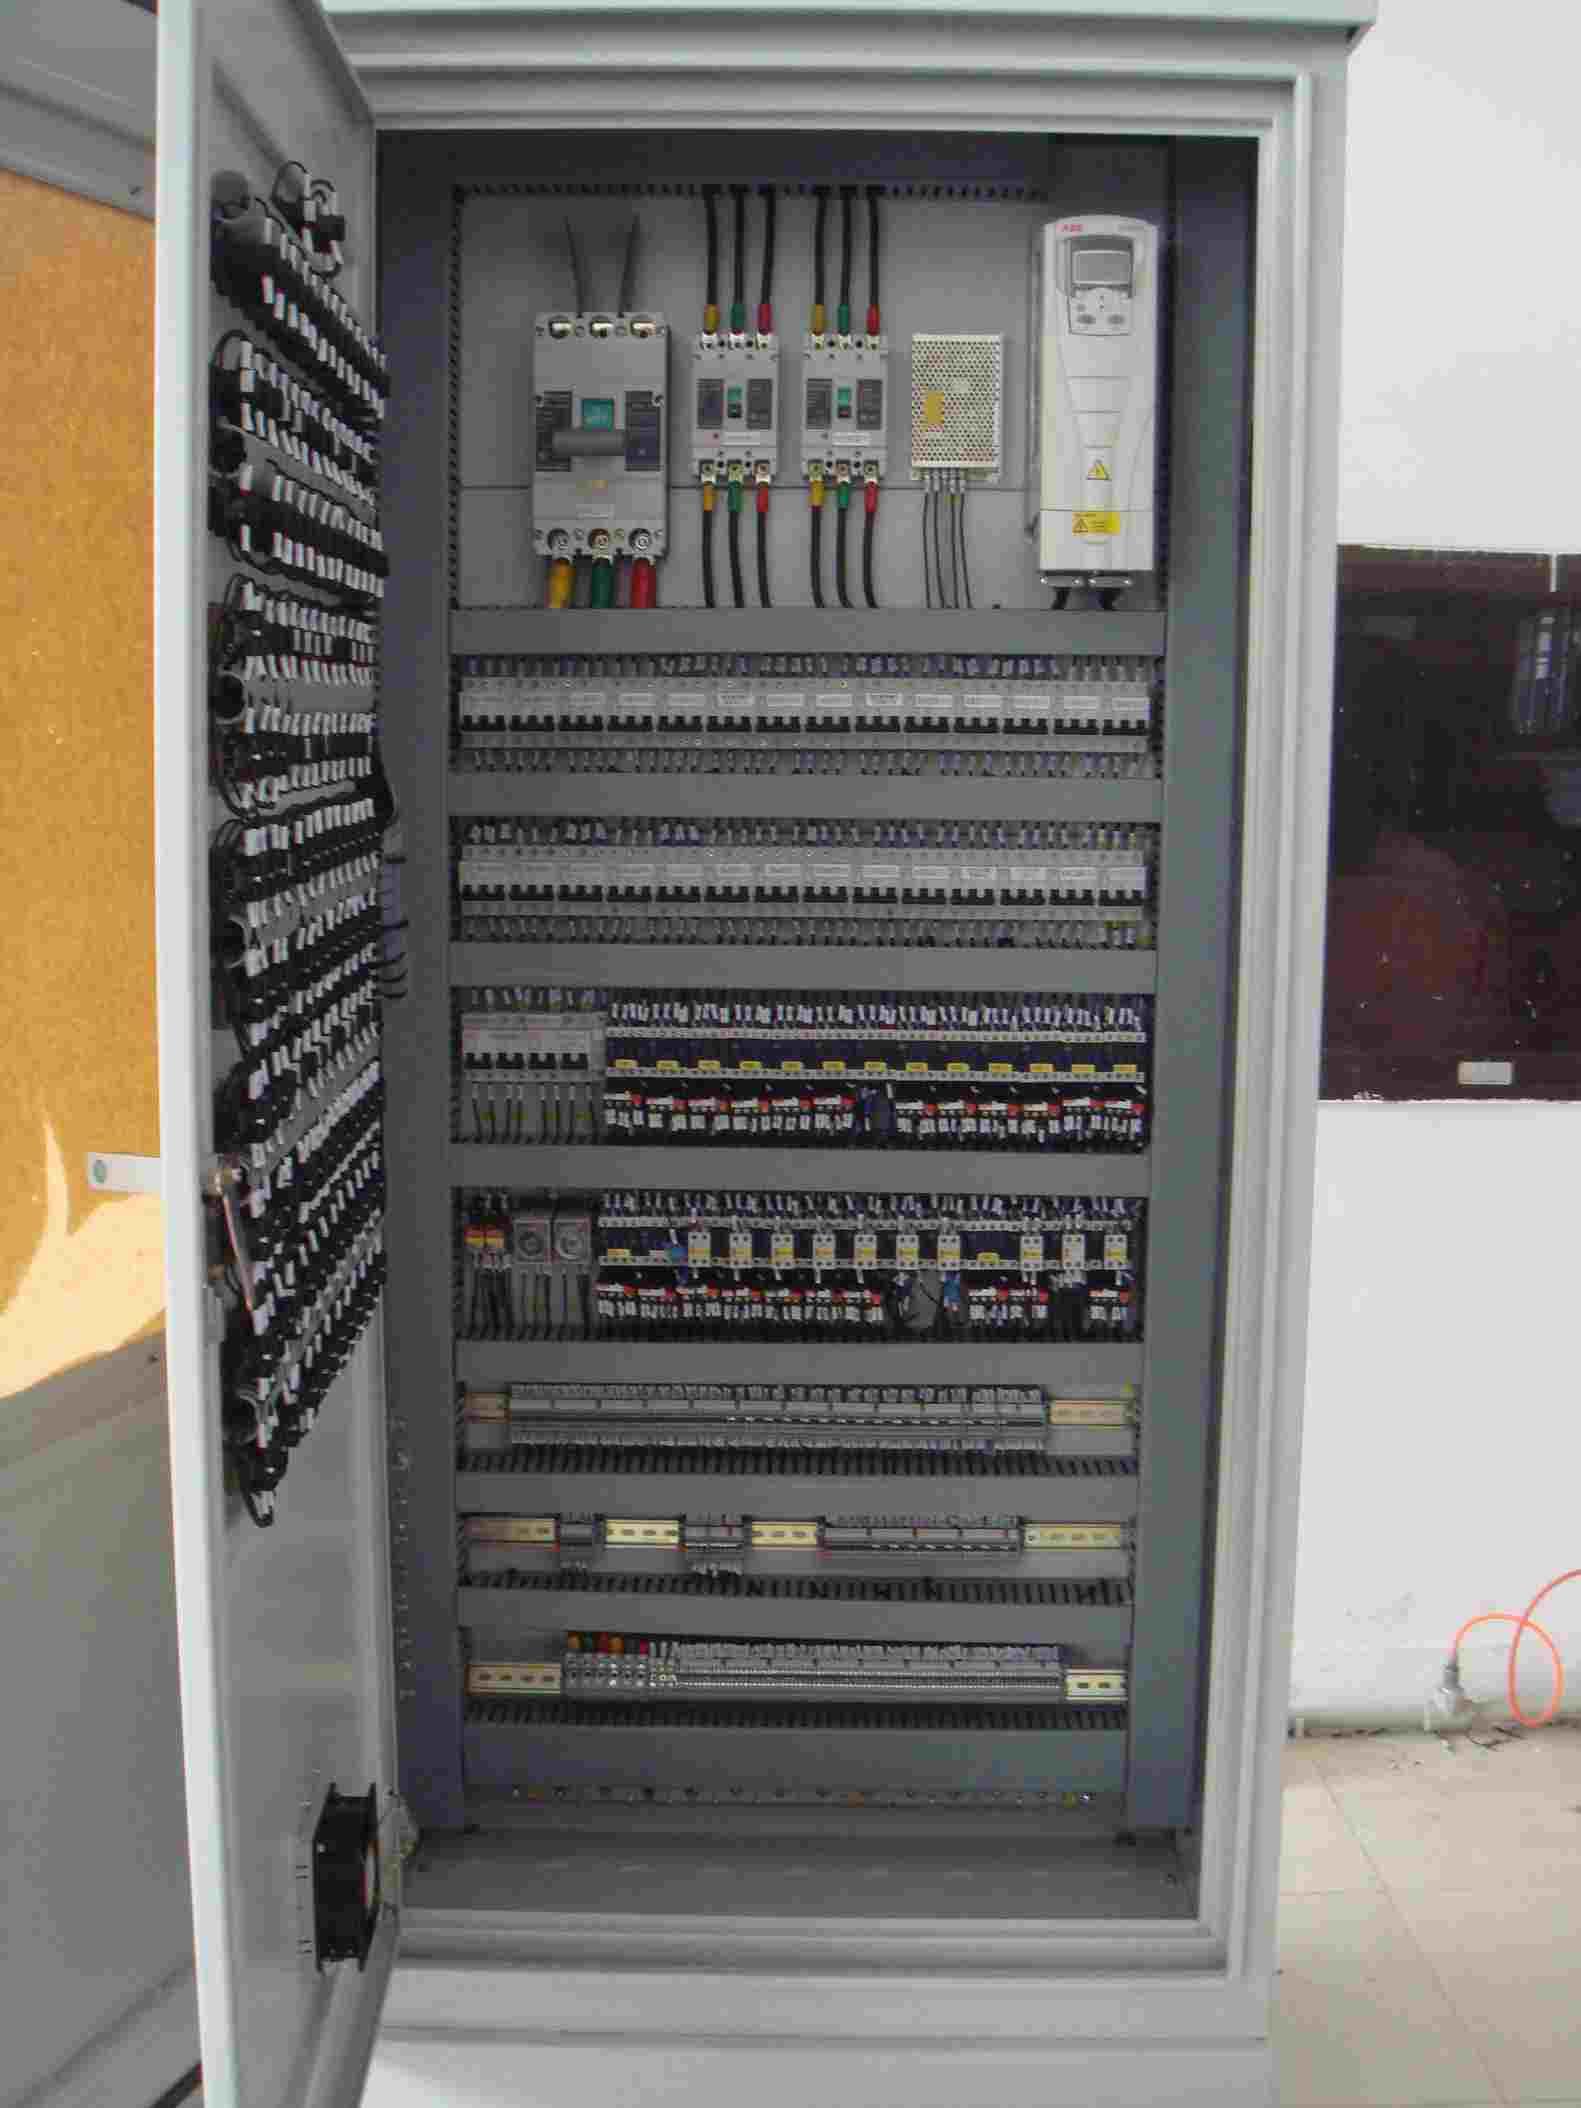 PLC控制柜内主要有哪些元件